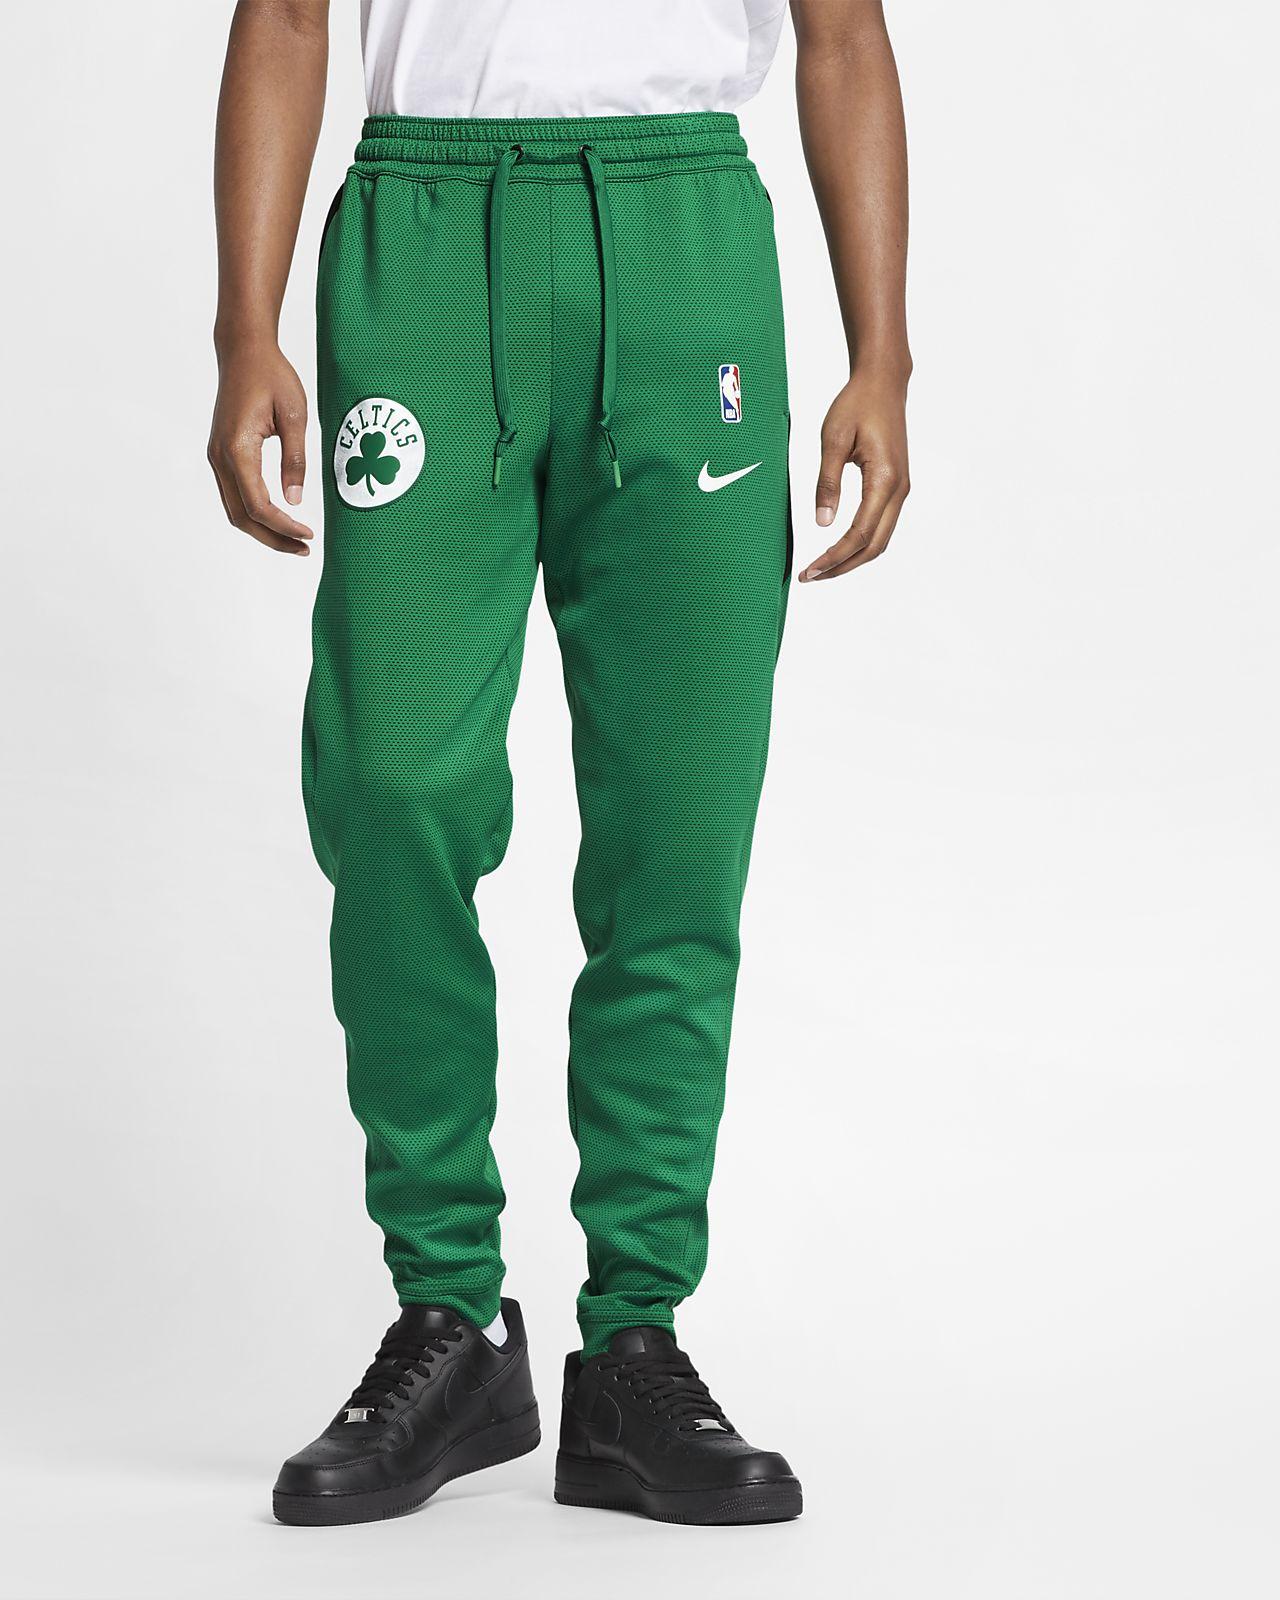 Pánské kalhoty NBA Boston Celtics Nike Therma Flex Showtime